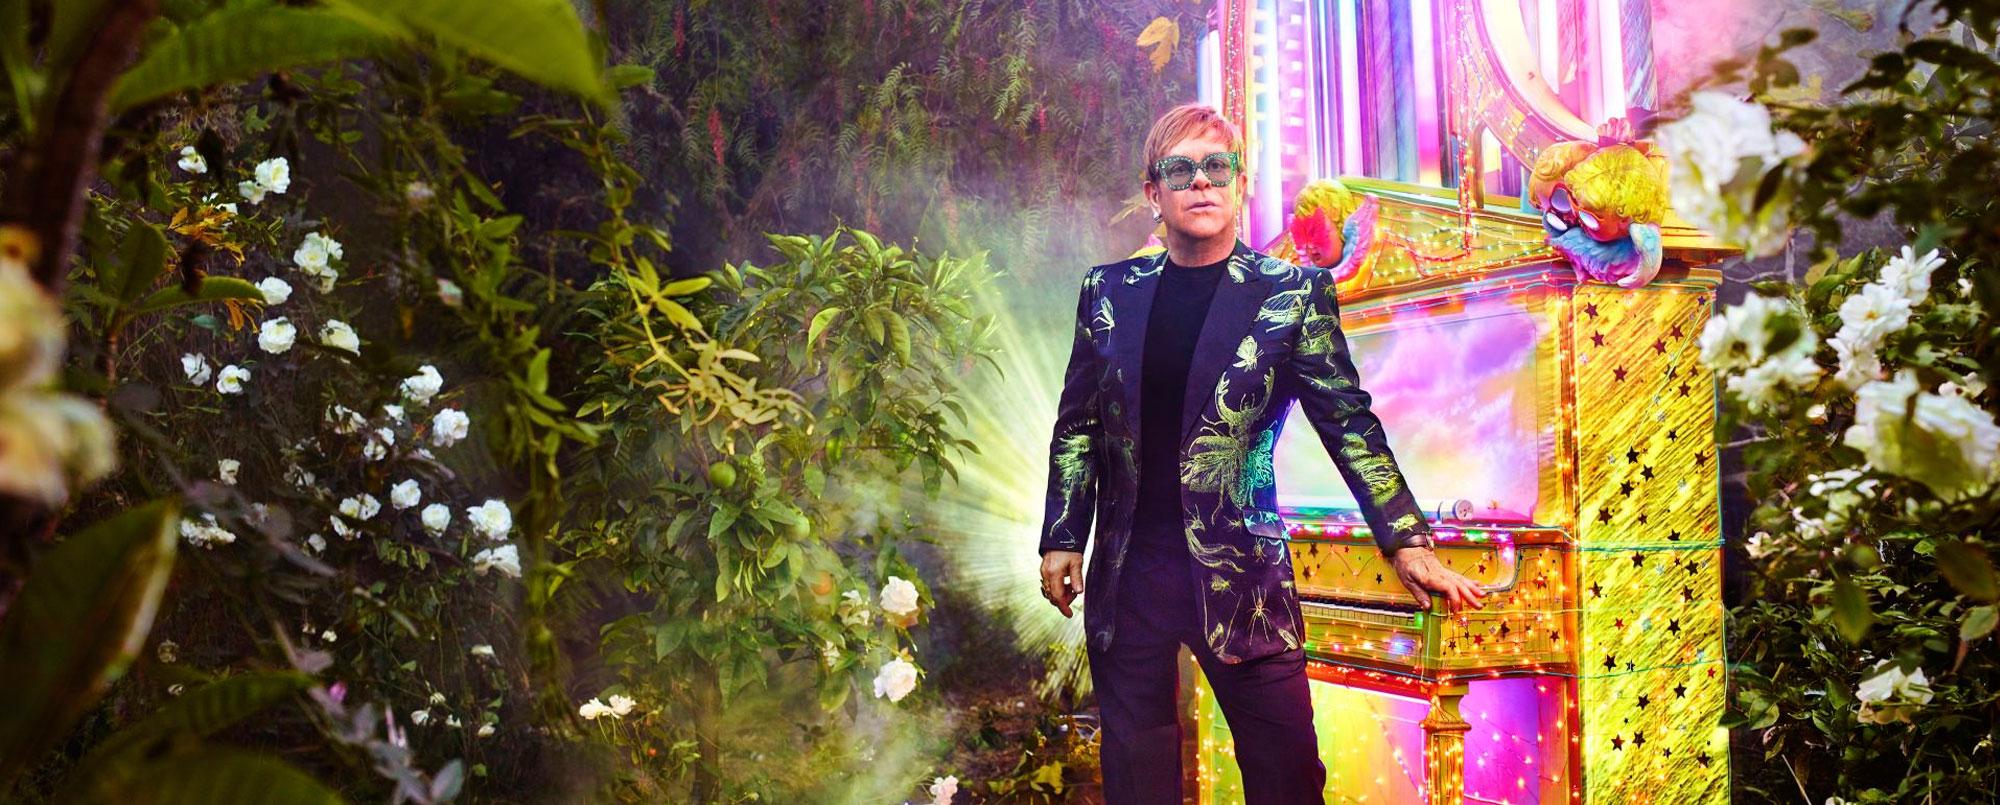 22.9.2020 Elton John